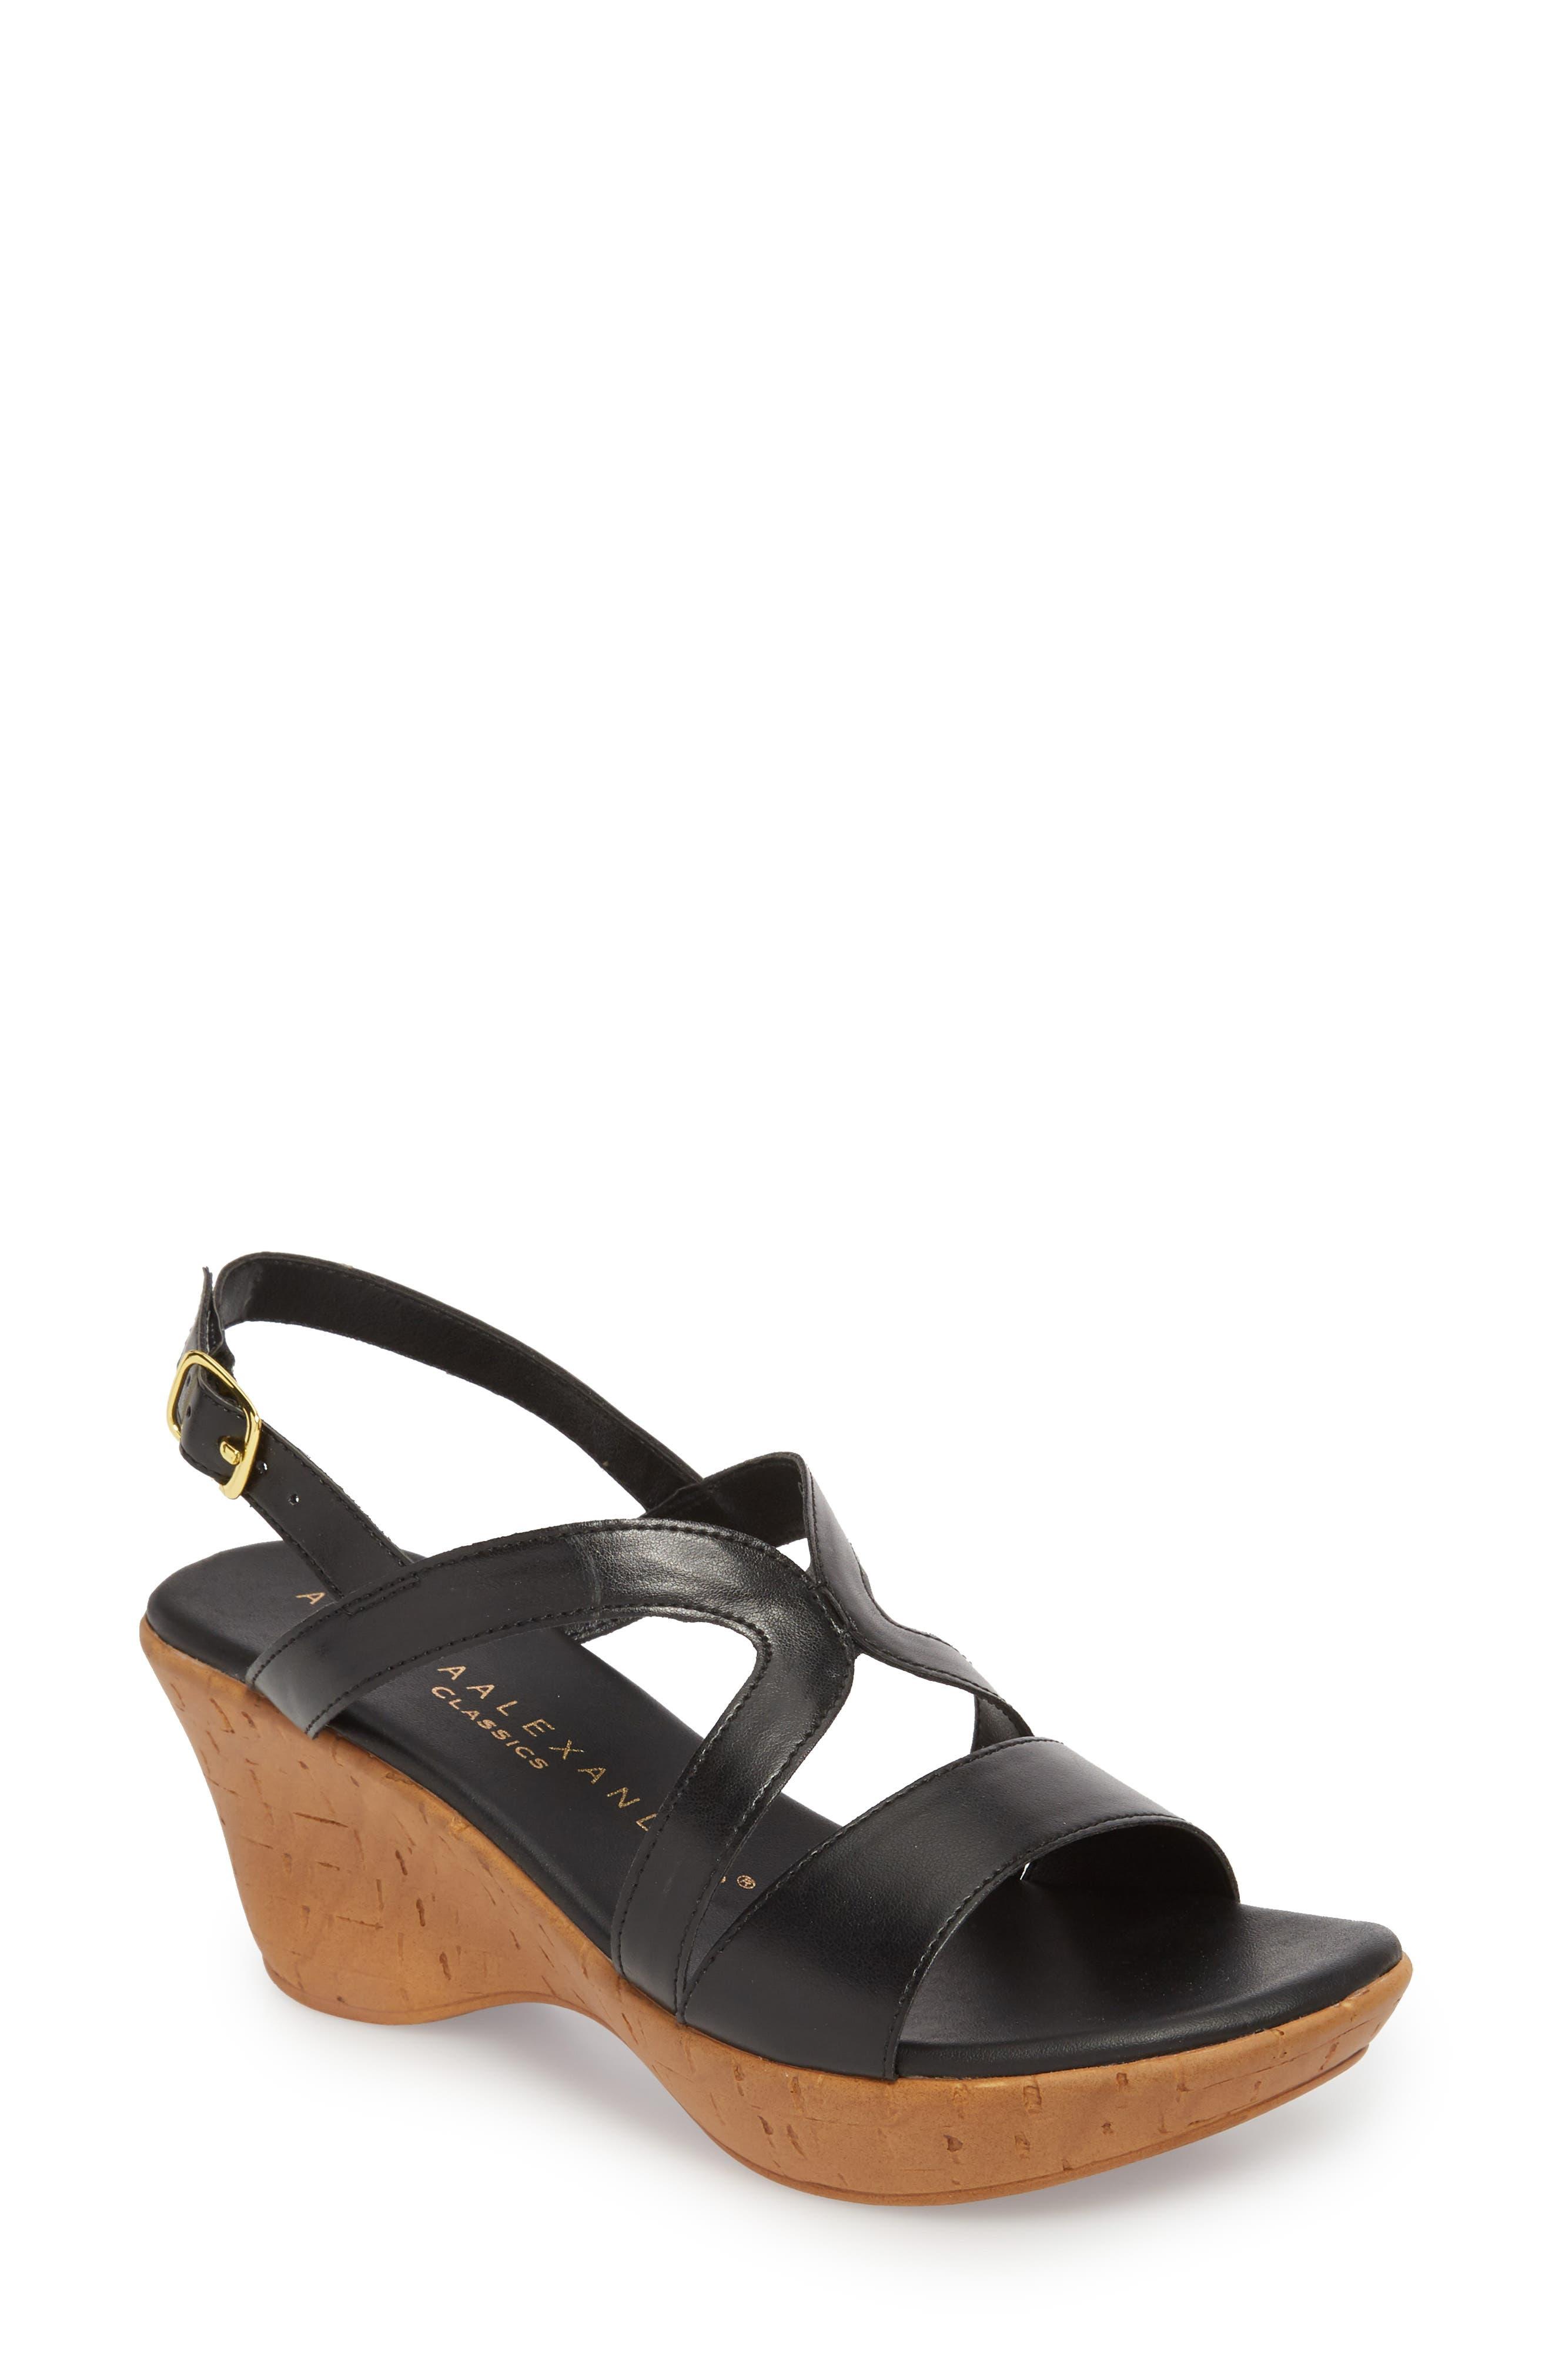 ATHENA ALEXANDER Pomade Wedge Sandal, Main, color, 001